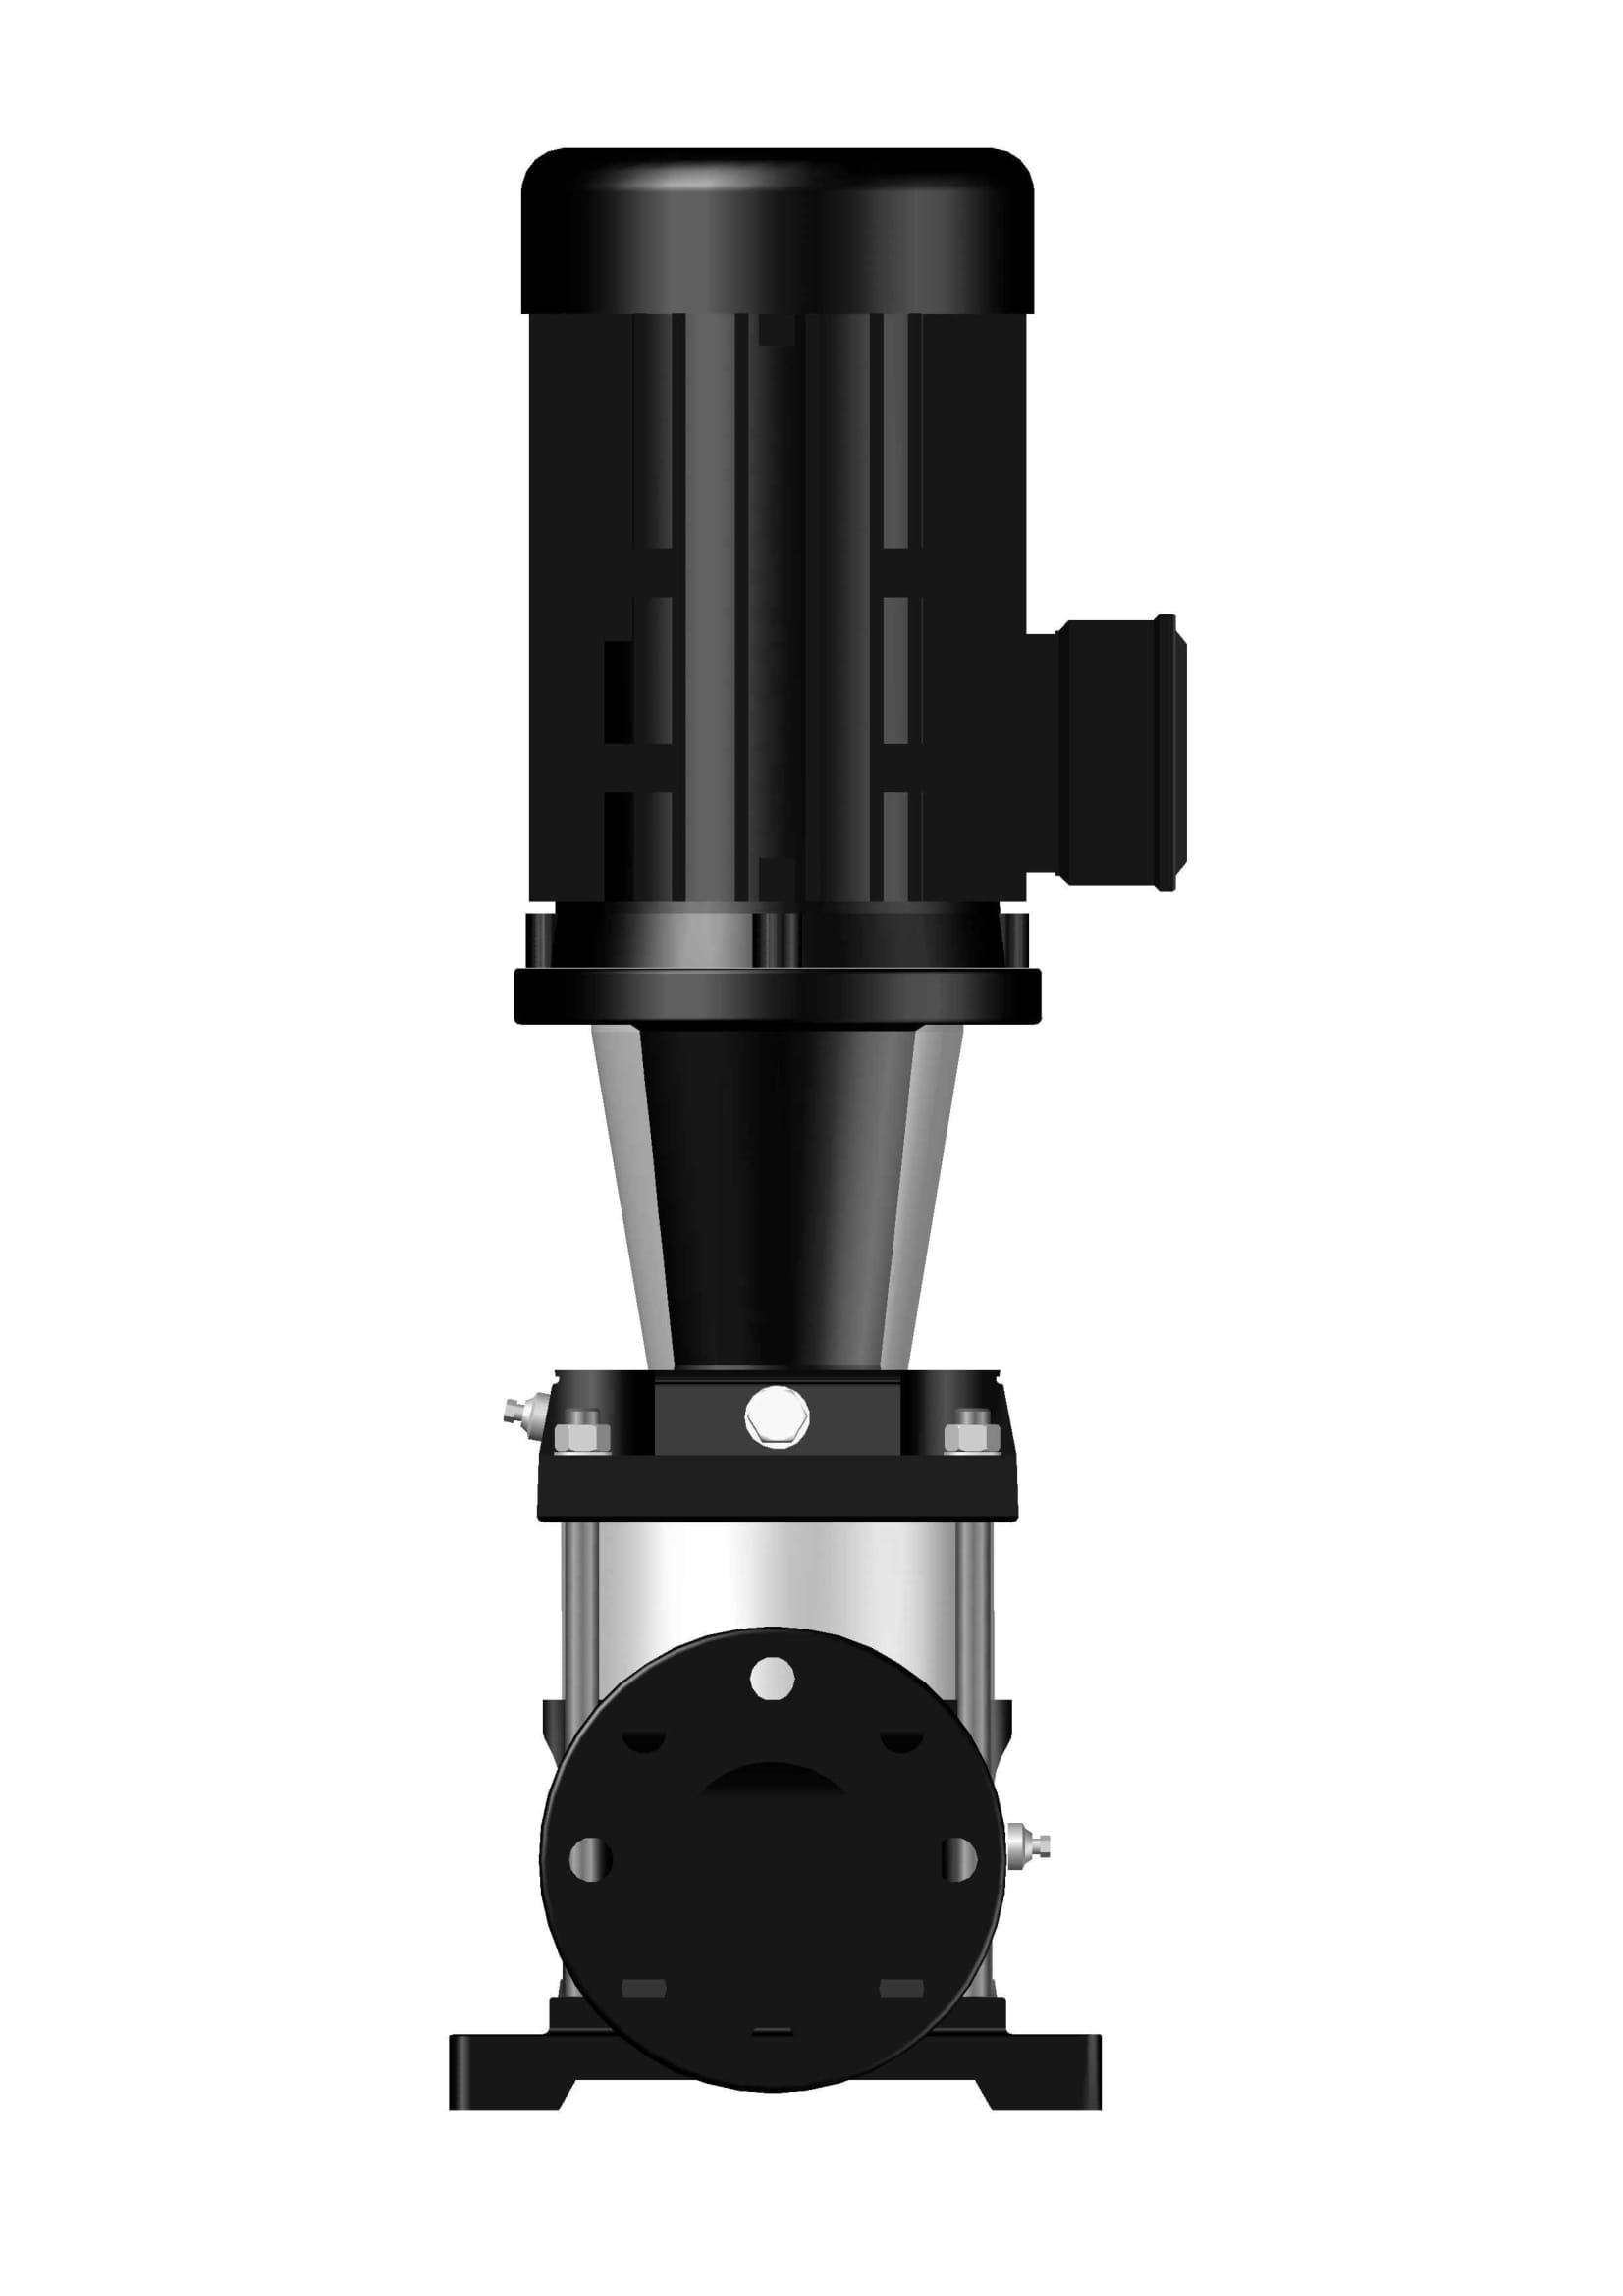 BV 90-01